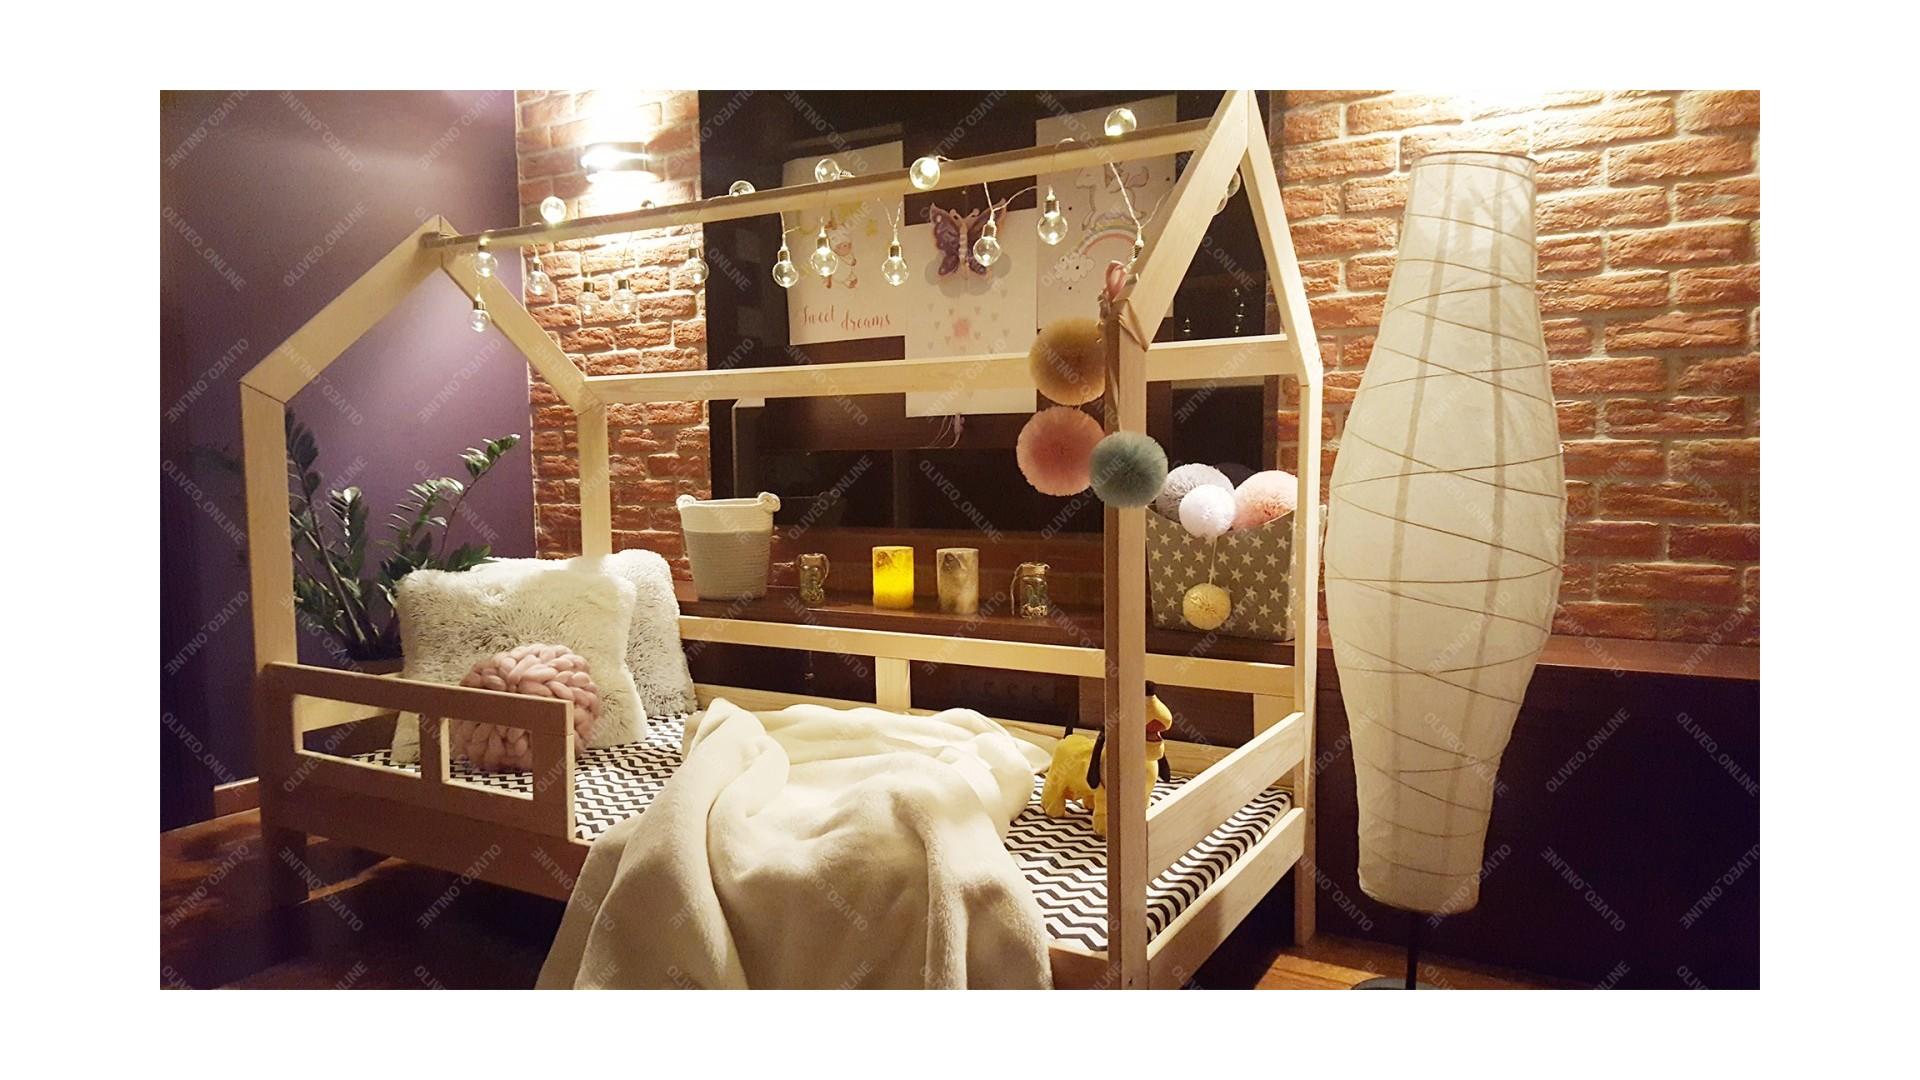 mon lit cabane lit pour enfants lit d 39 enfant lit b b. Black Bedroom Furniture Sets. Home Design Ideas